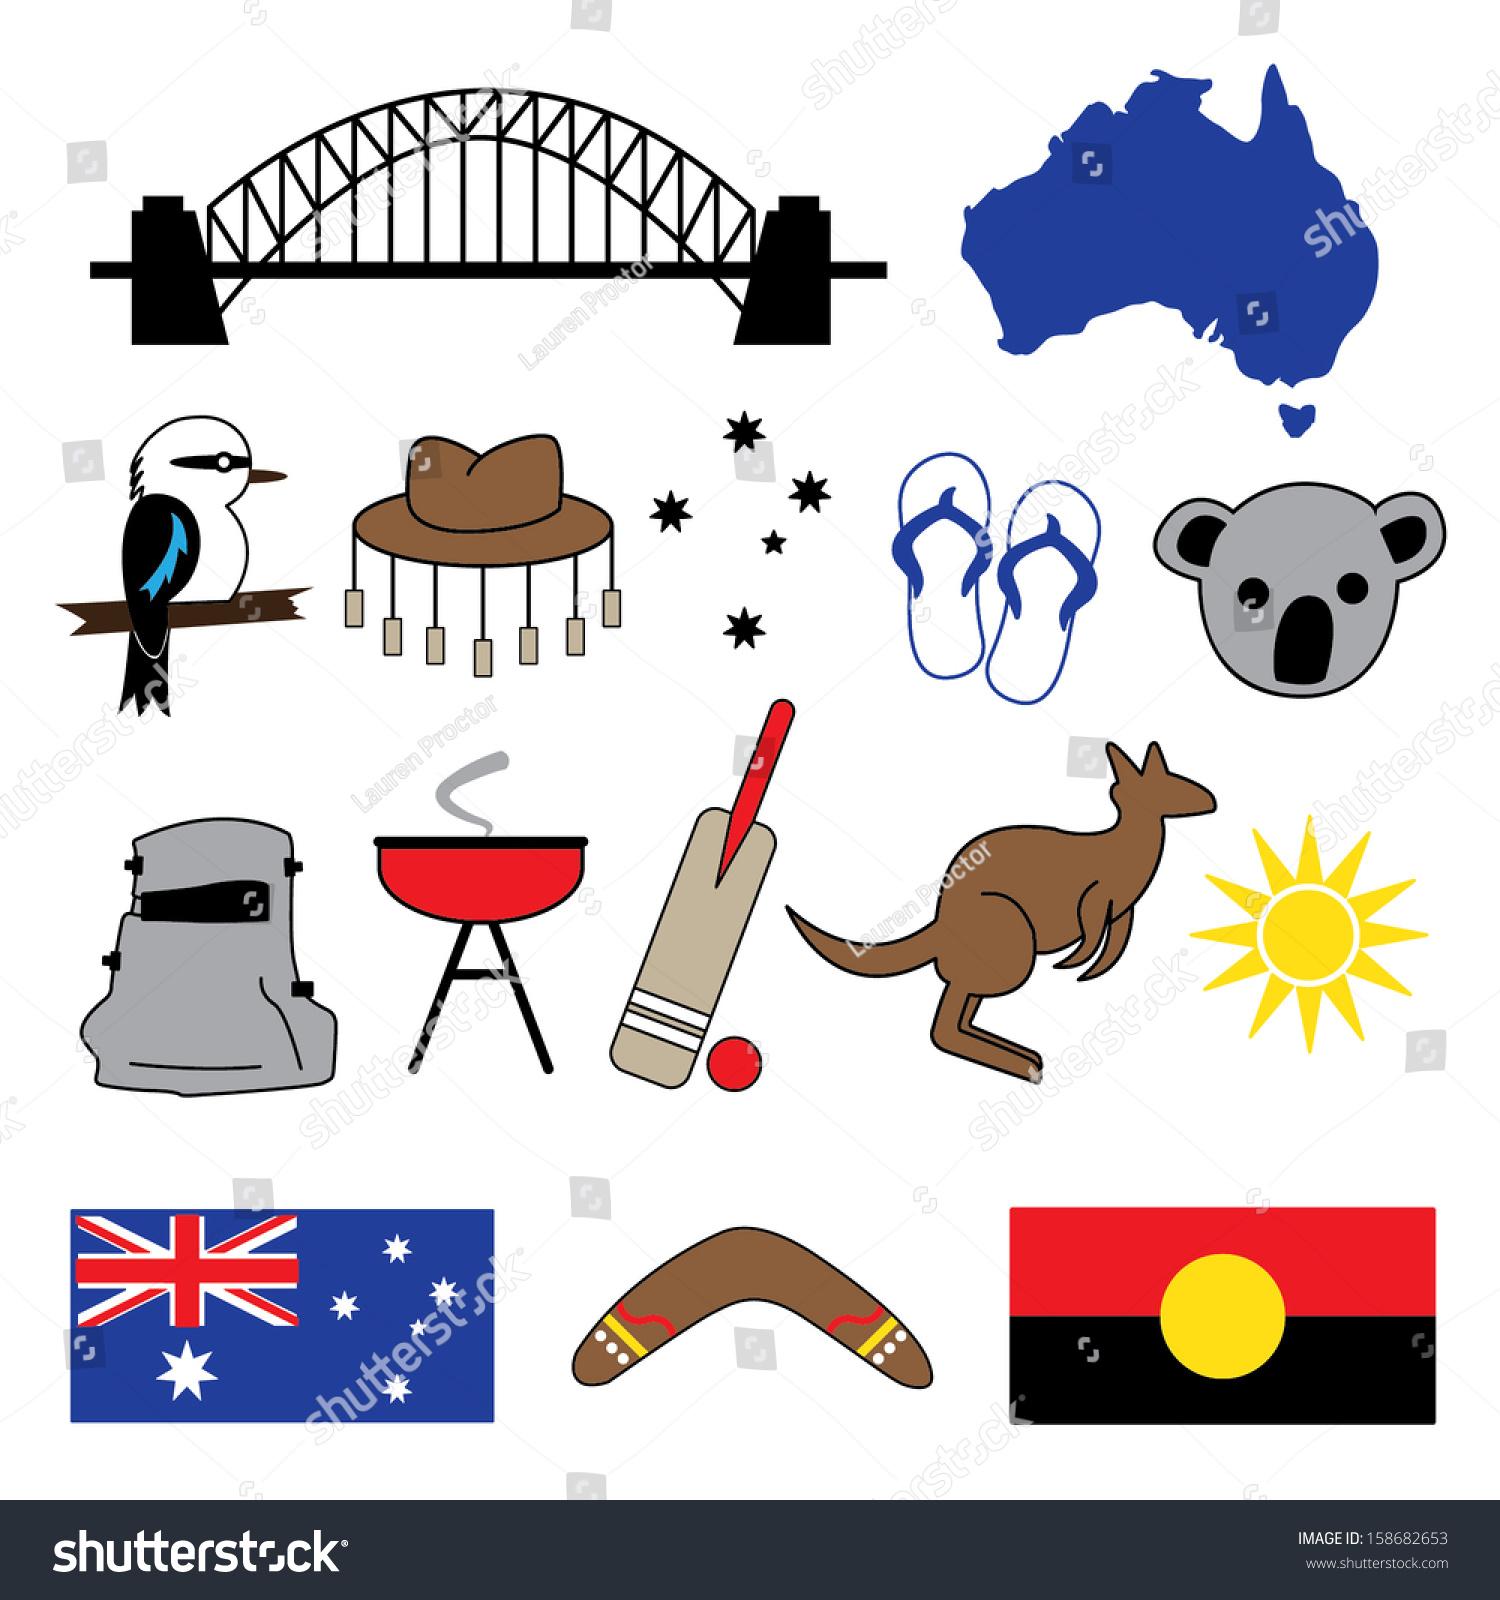 Australian icons symbols stock vector 158682653 shutterstock australian icons symbols biocorpaavc Choice Image